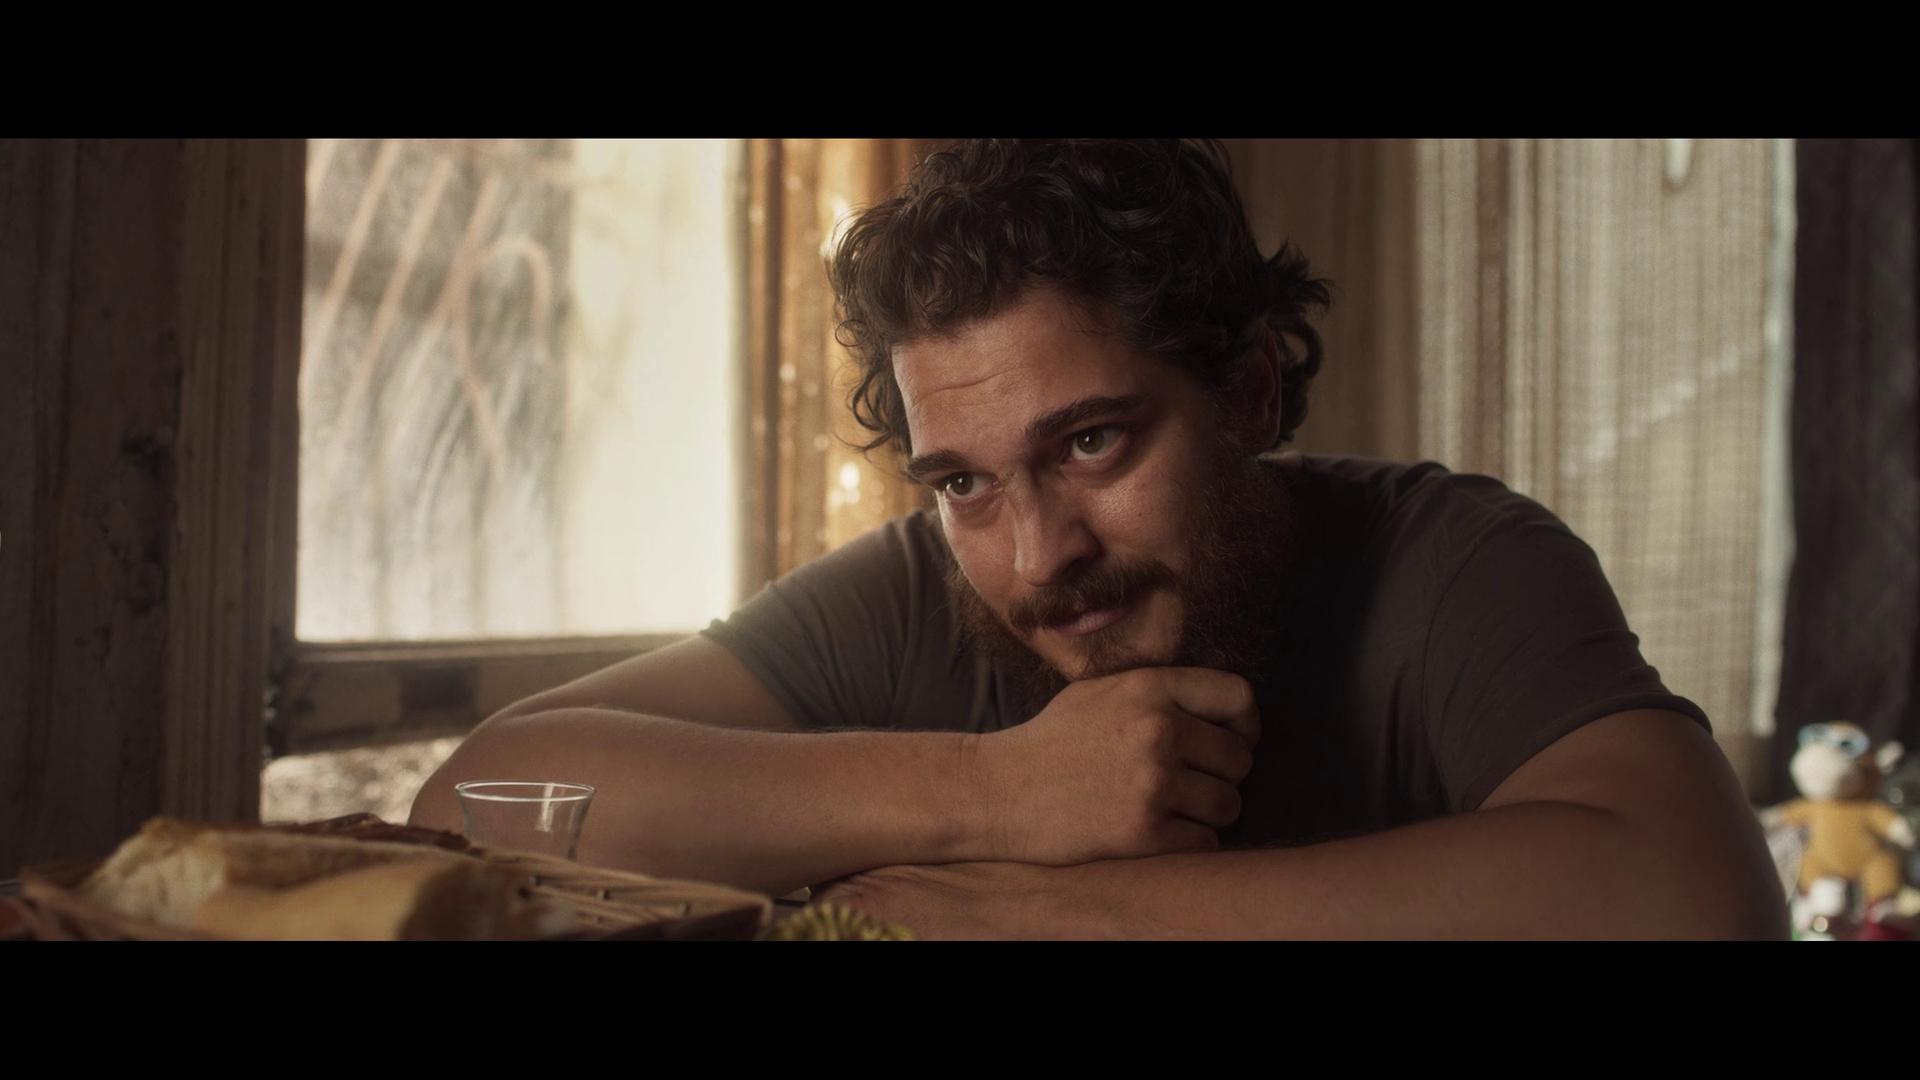 Vidas de papel (2021) 1080p WEB-DL Latino